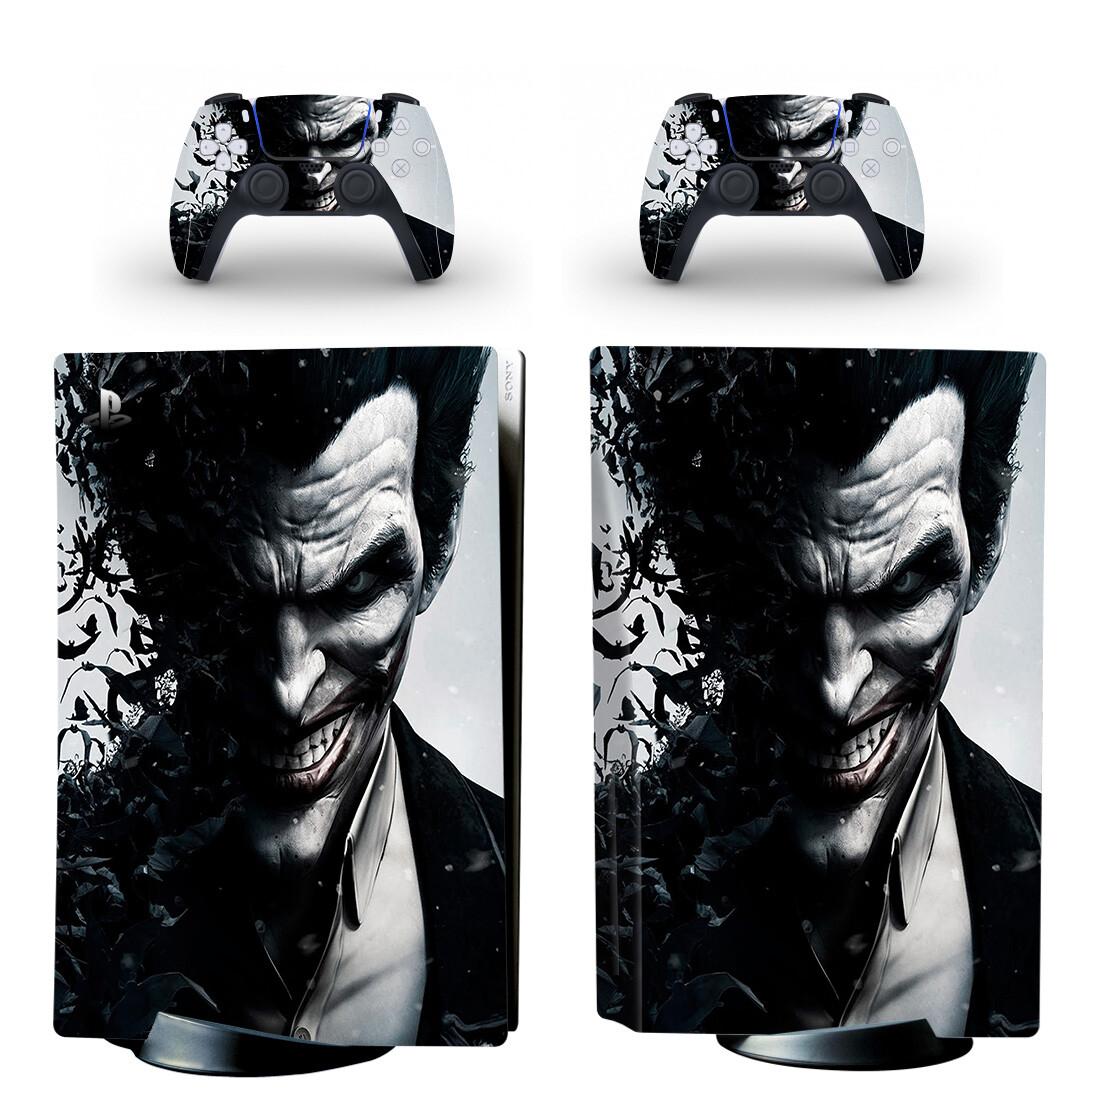 Joker Skin Sticker Decal For PlayStation 5 Design 7